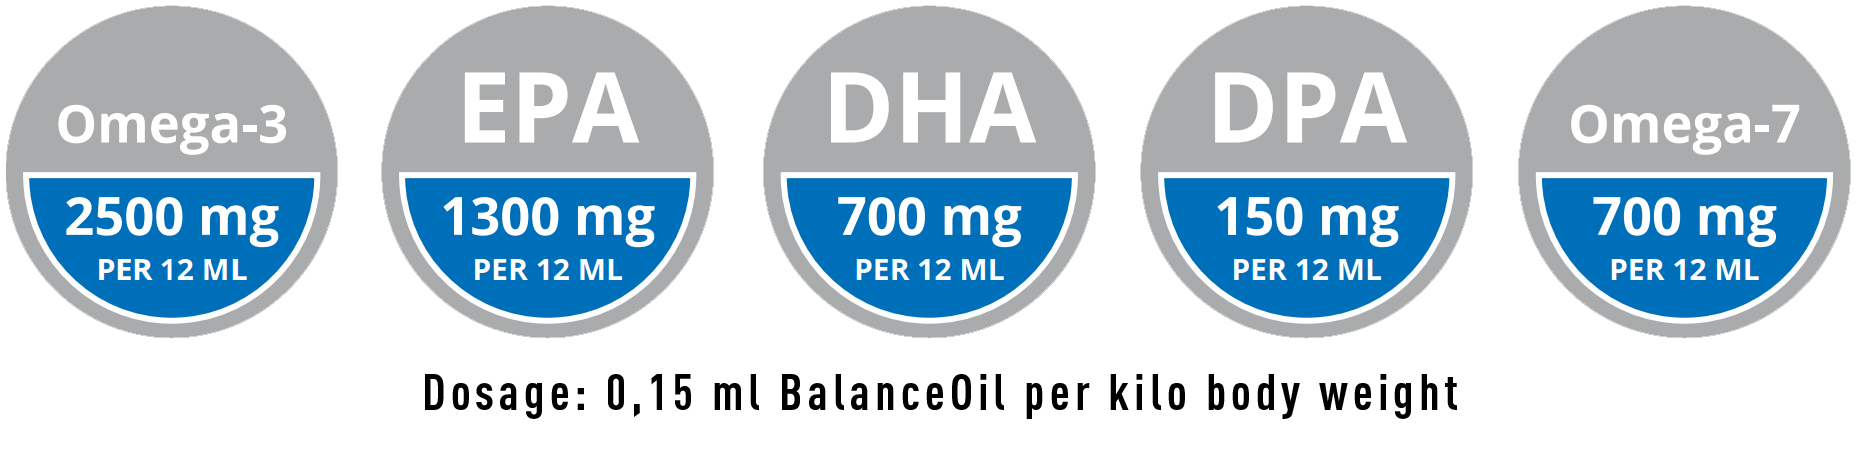 Zinzino BalanceOil - Omega 3 Fatty Acids , EPA, DHA, DPA, Omega7 Ratio